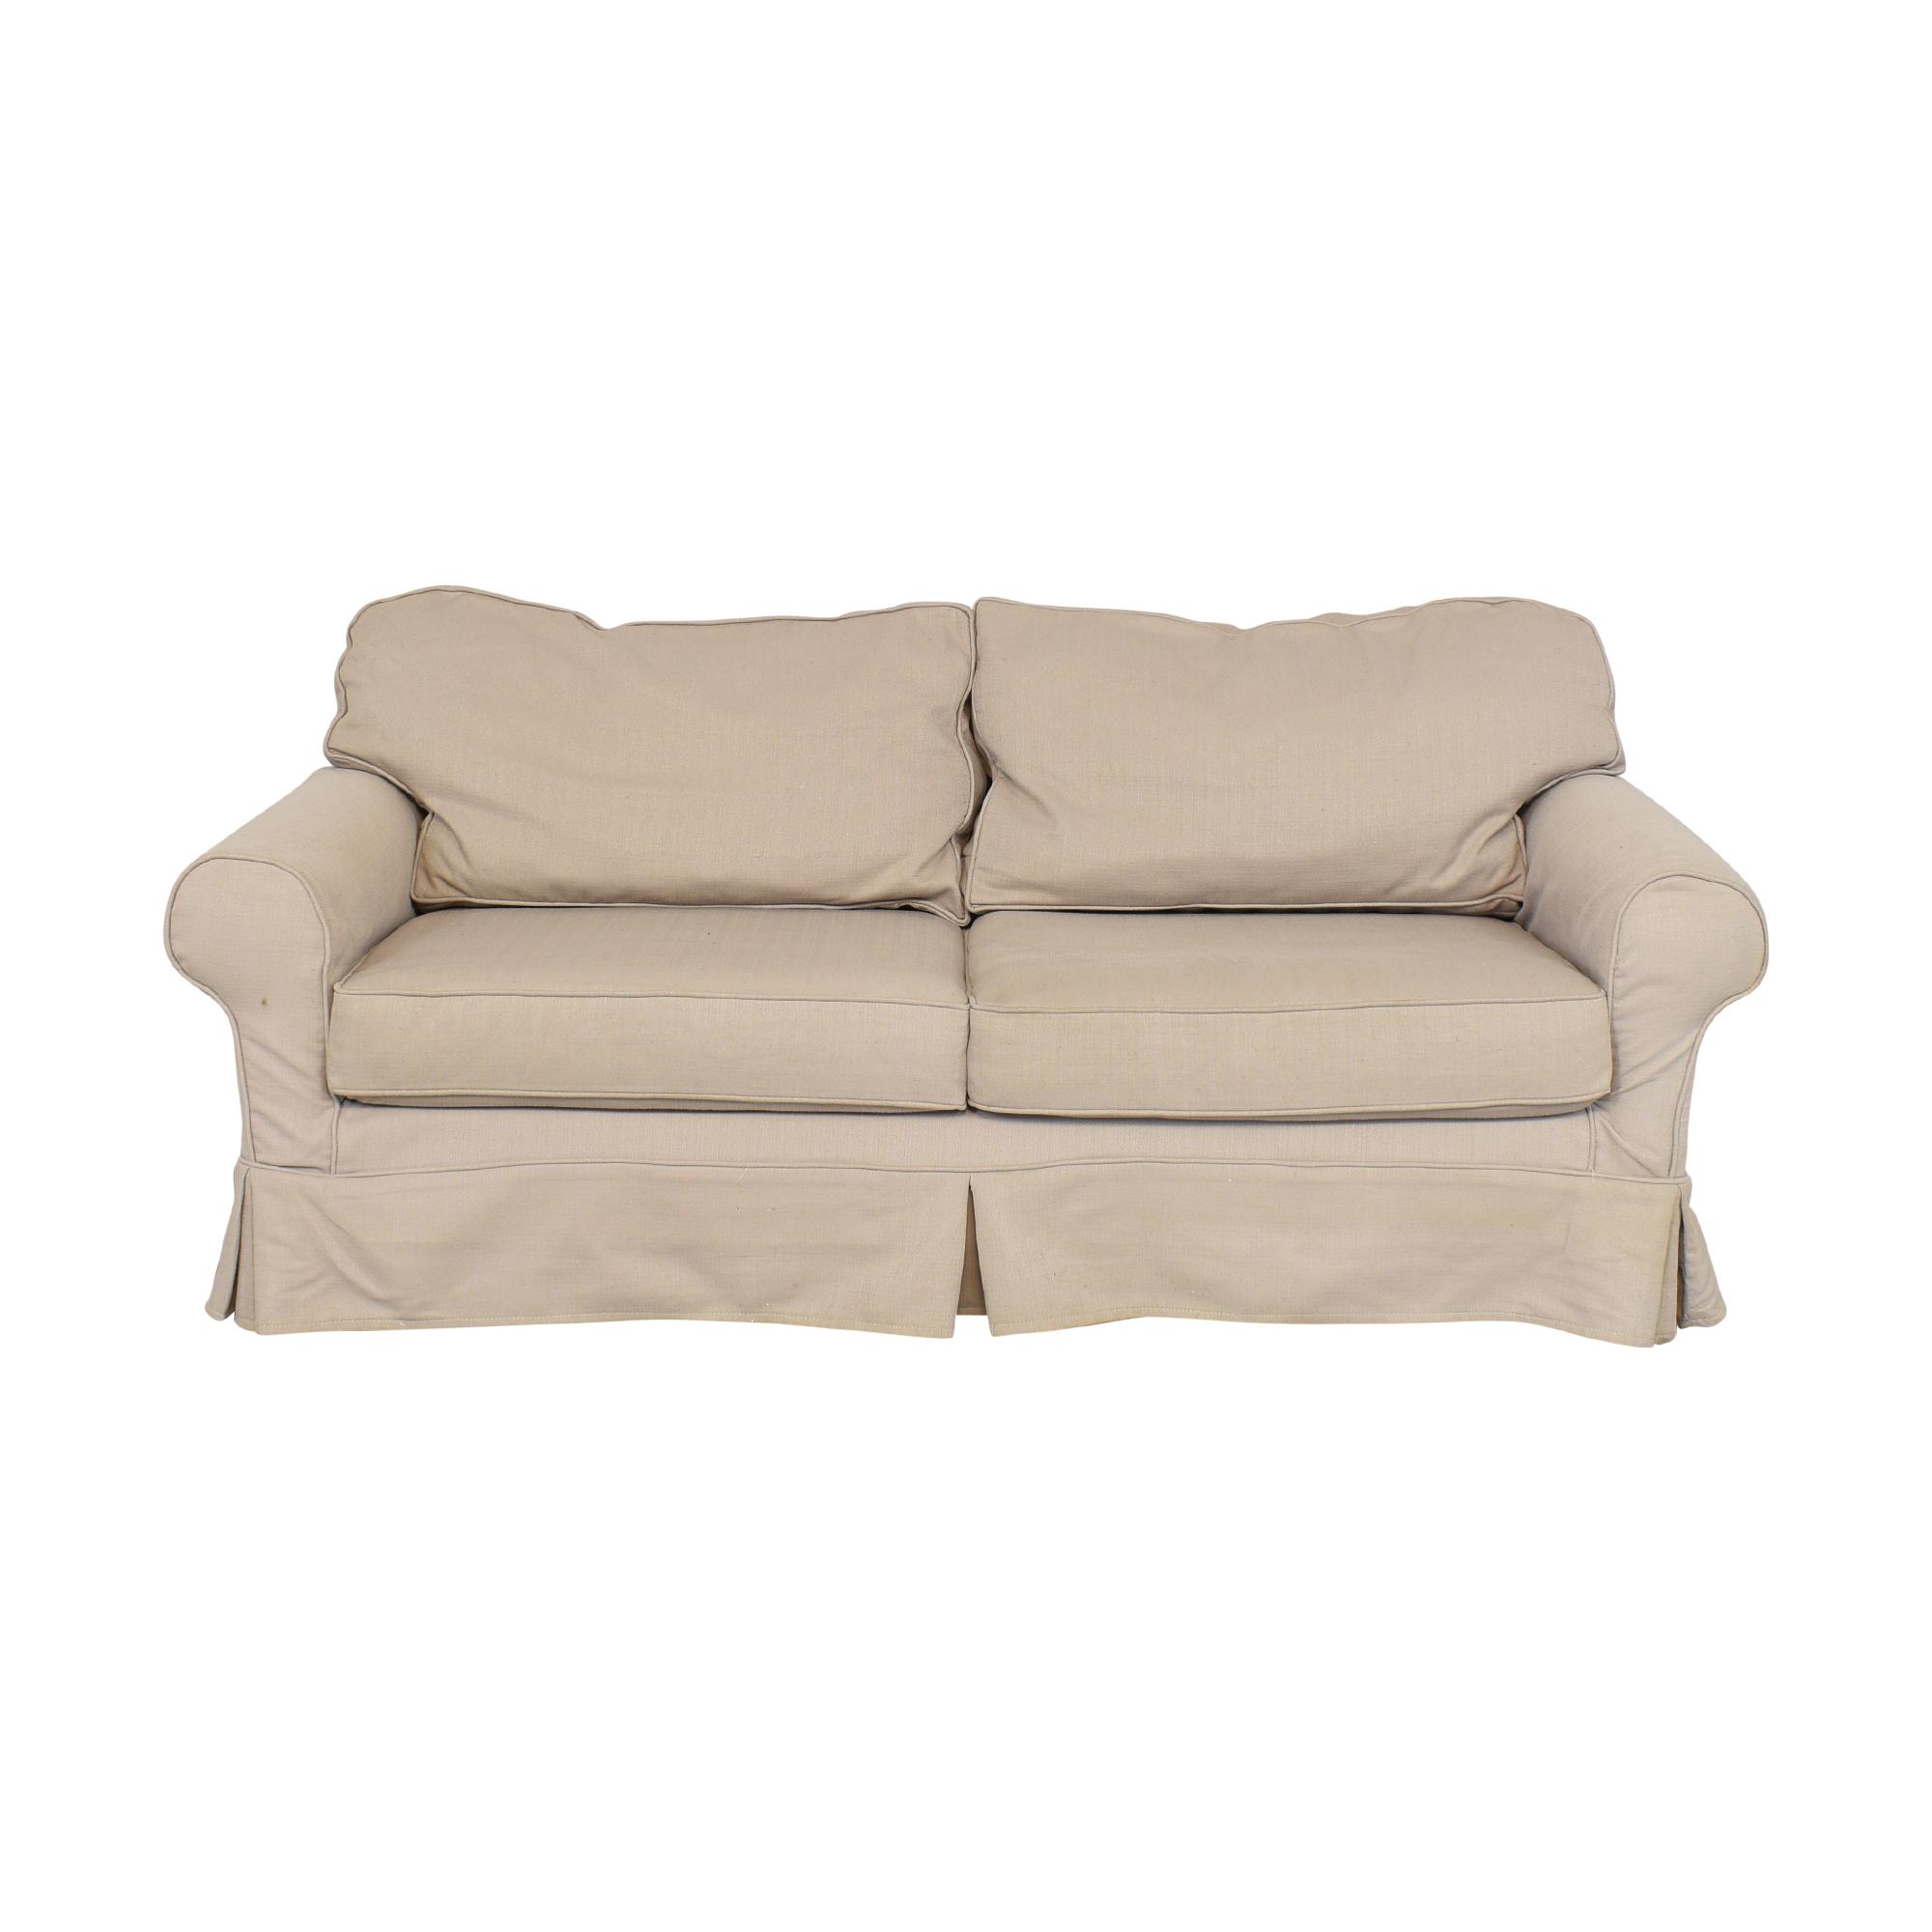 Mitchell Gold + Bob Williams Mitchell Gold + Bob Williams Slipcover Sofa